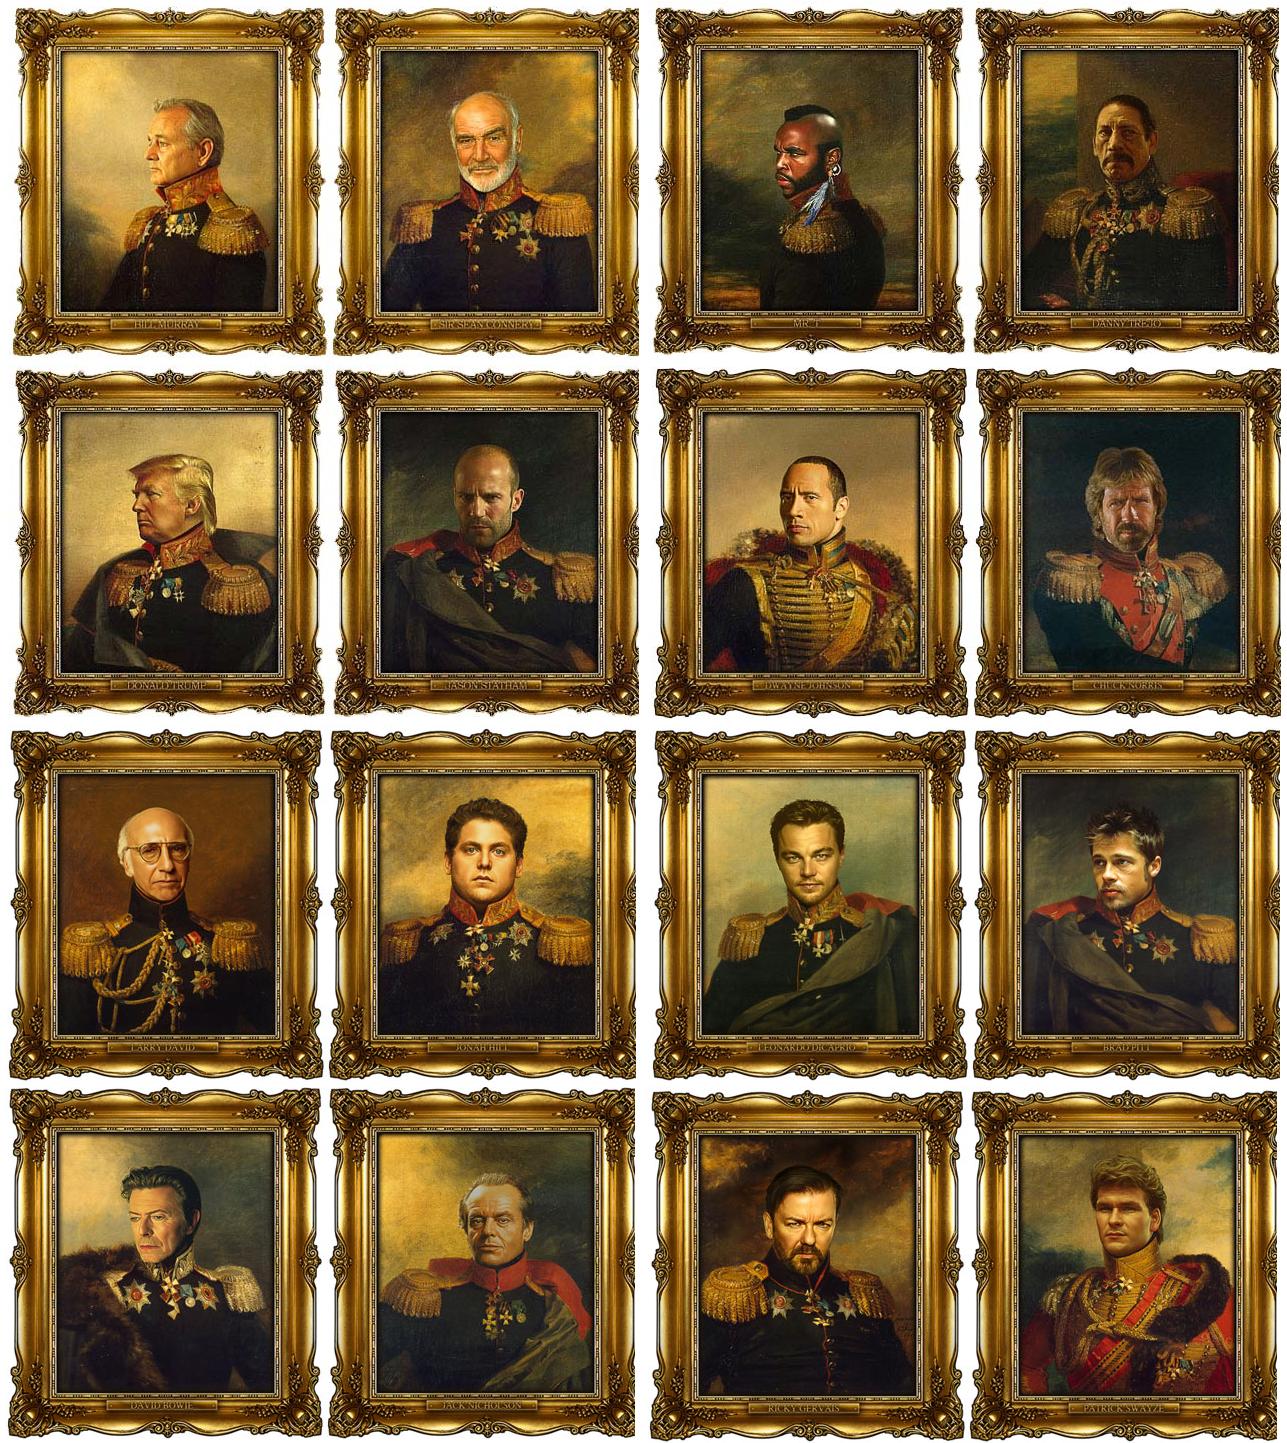 Bad Ass Generals Pt. 2. .. WHERE THE IS EWAN MACGREGOR??!?!?!!!?!?!?!?!?!?!?!?one?!?!?!1?!?!?